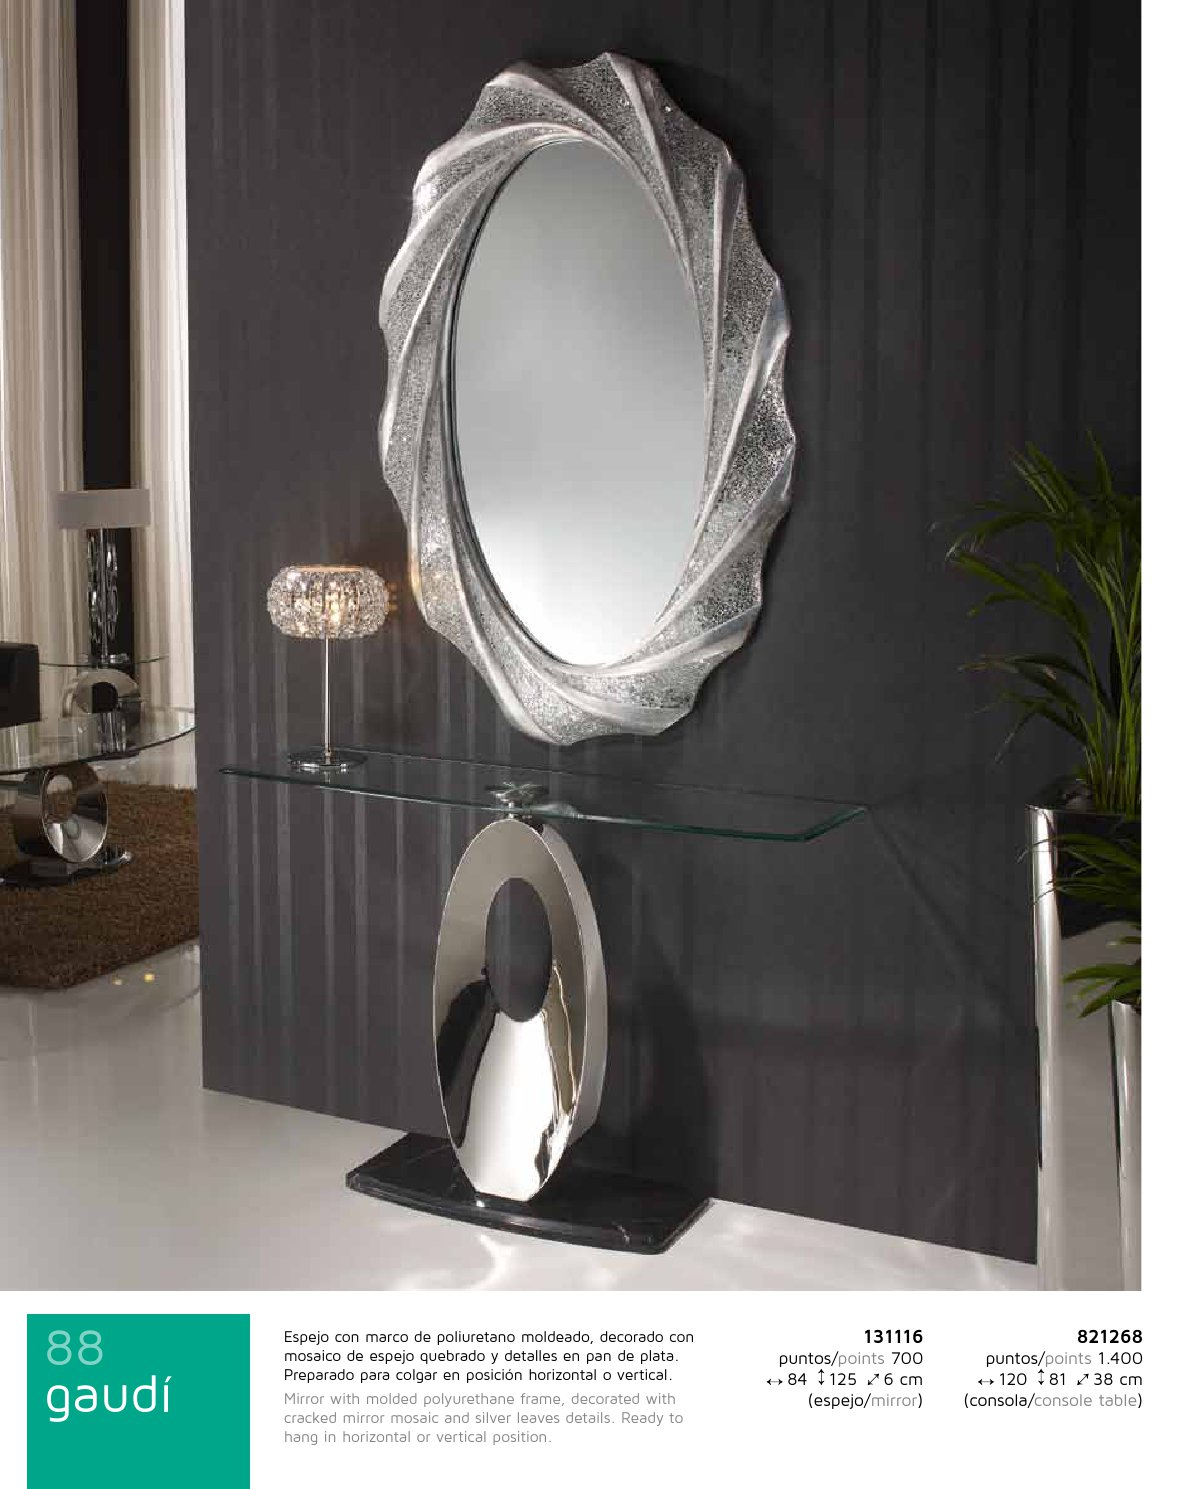 Gaudi espejo Ovalado 125x84cm - Pan de Plata Schuller Foto